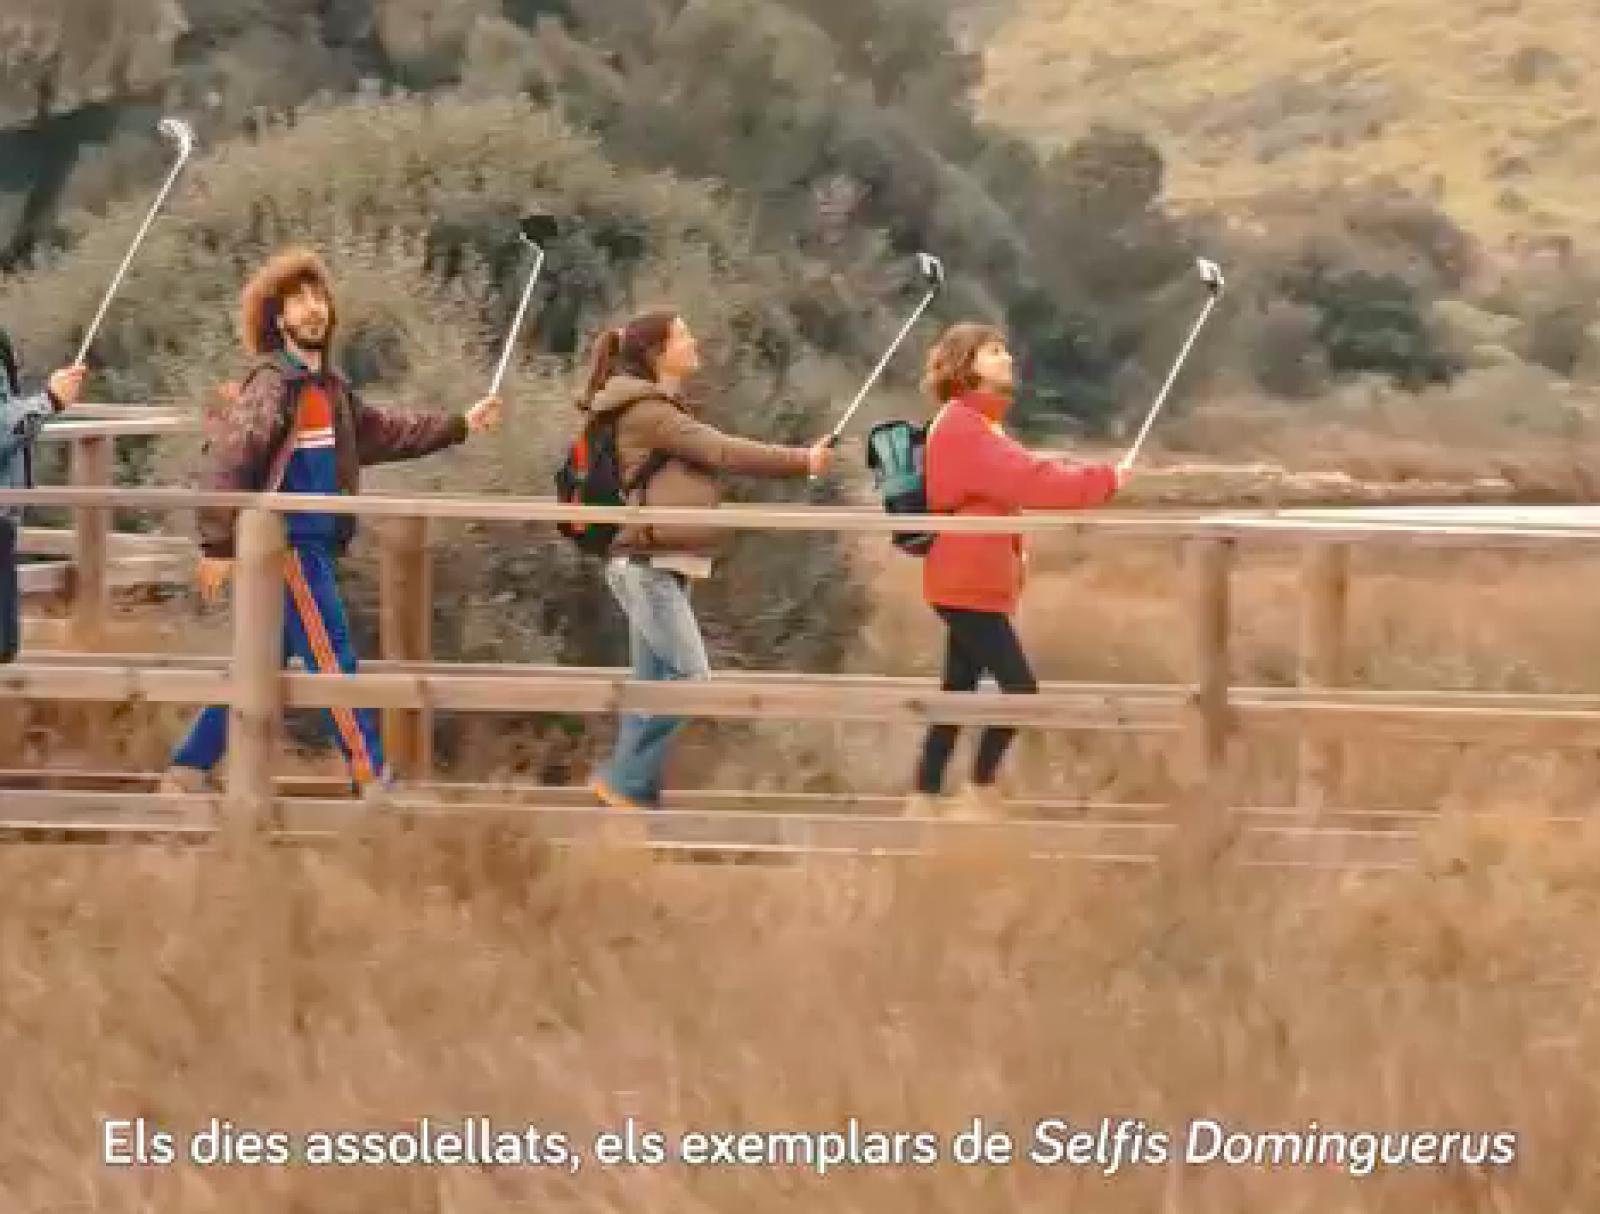 Selfis dominguerus